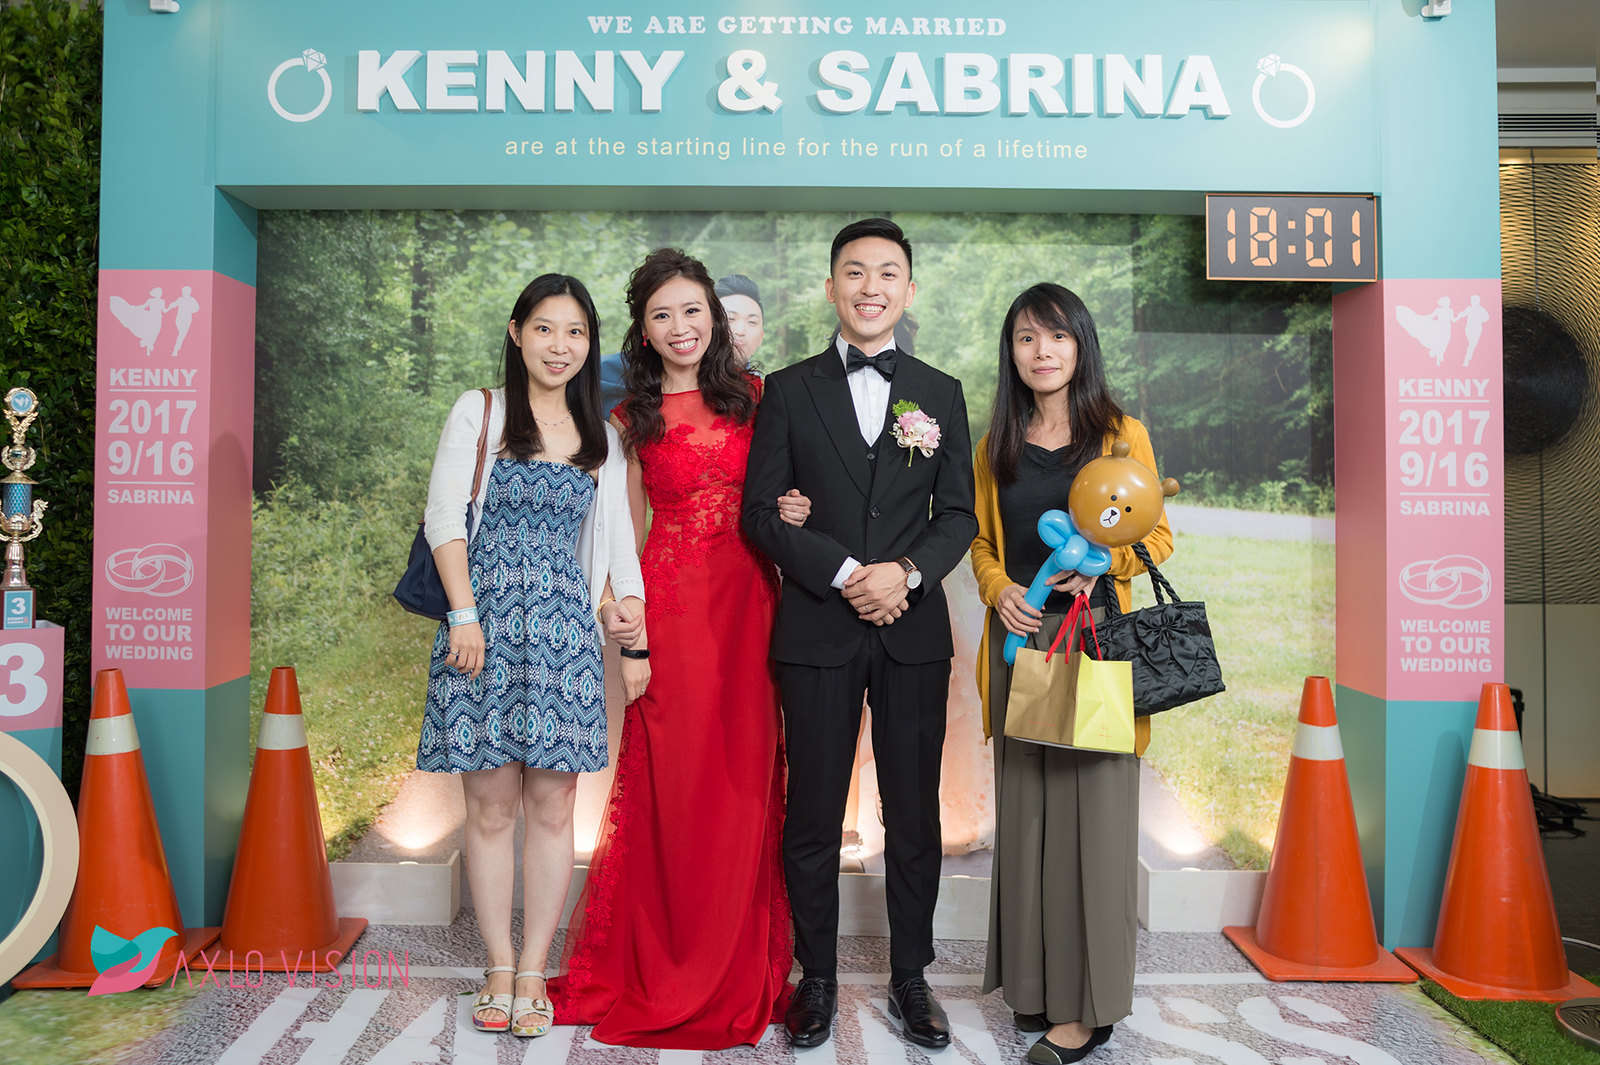 20170916 WeddingDay_186